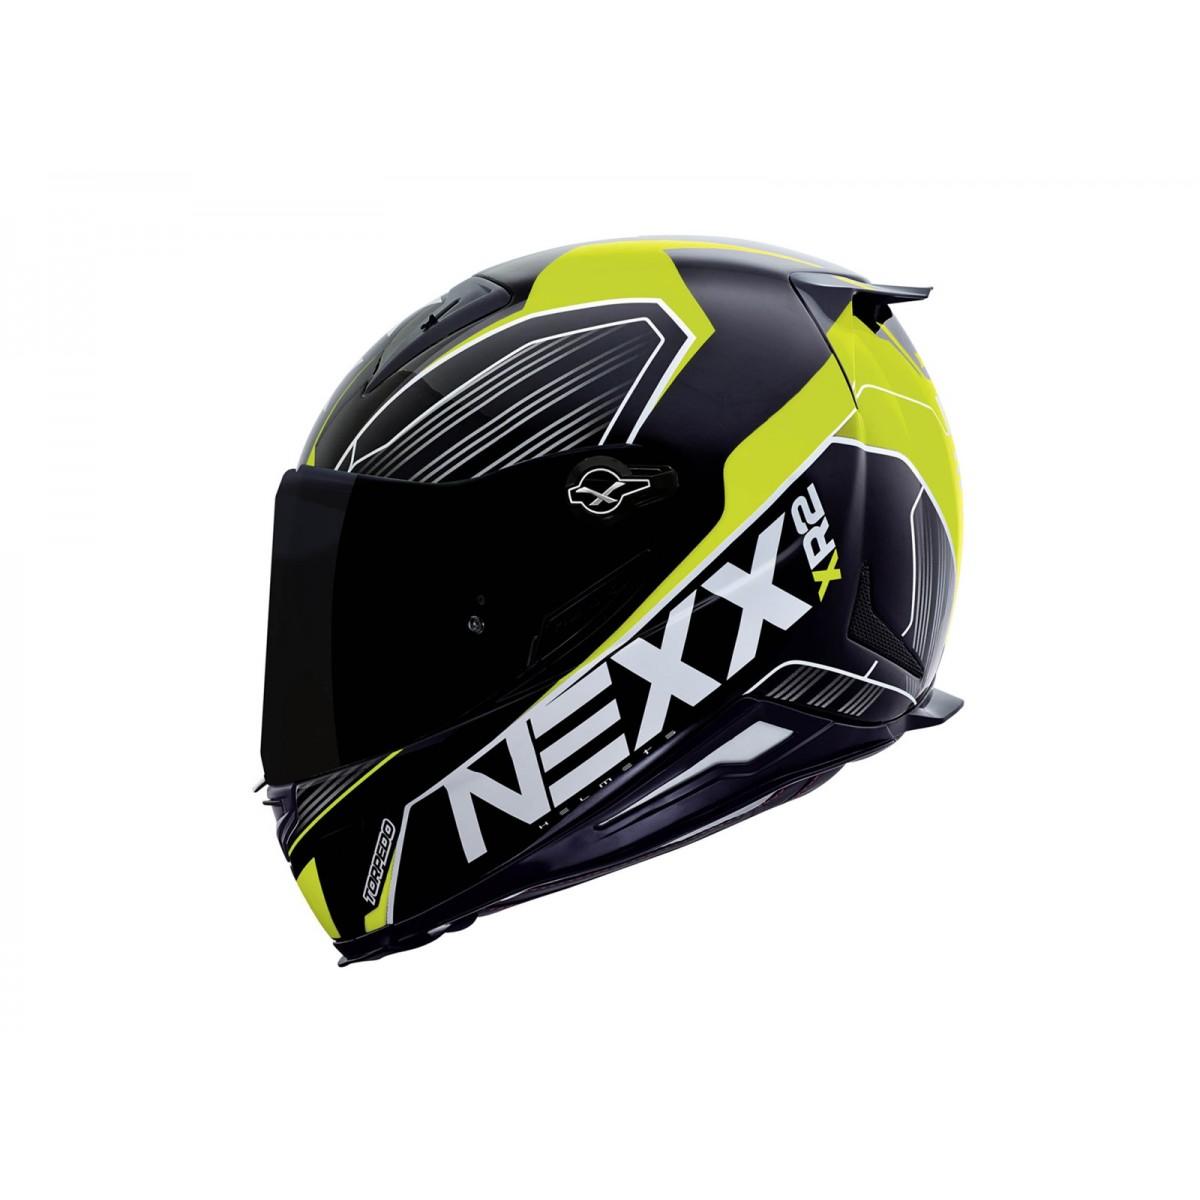 Capacete Nexx XR2 Torpedo Amarelo Neon  - Super Bike - Loja Oficial Alpinestars